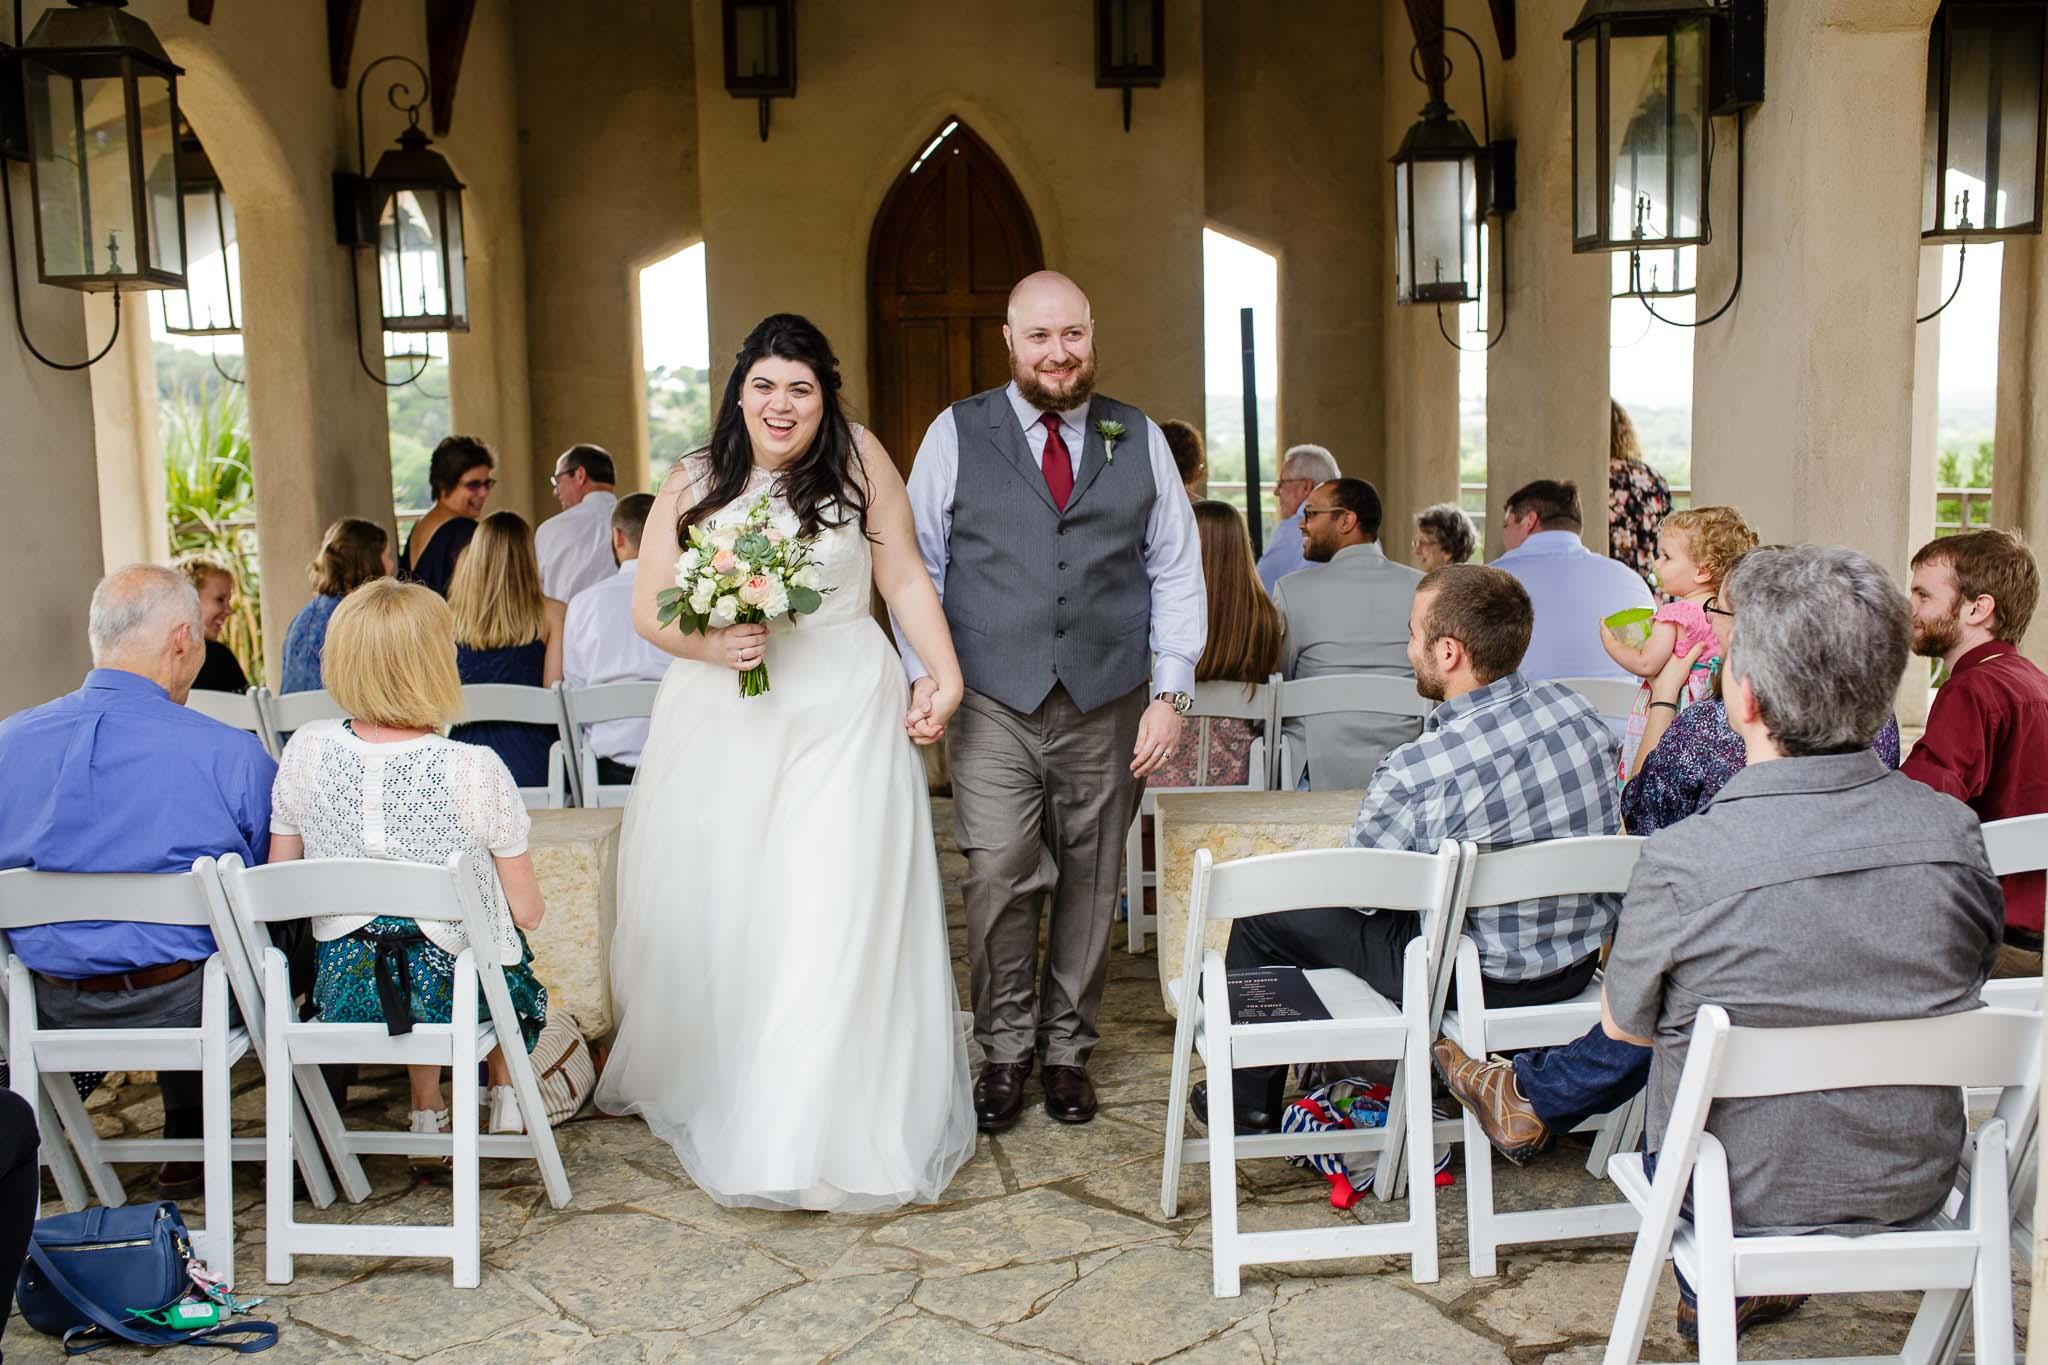 bride-groom-exit-chapel-dulcinea.jpg